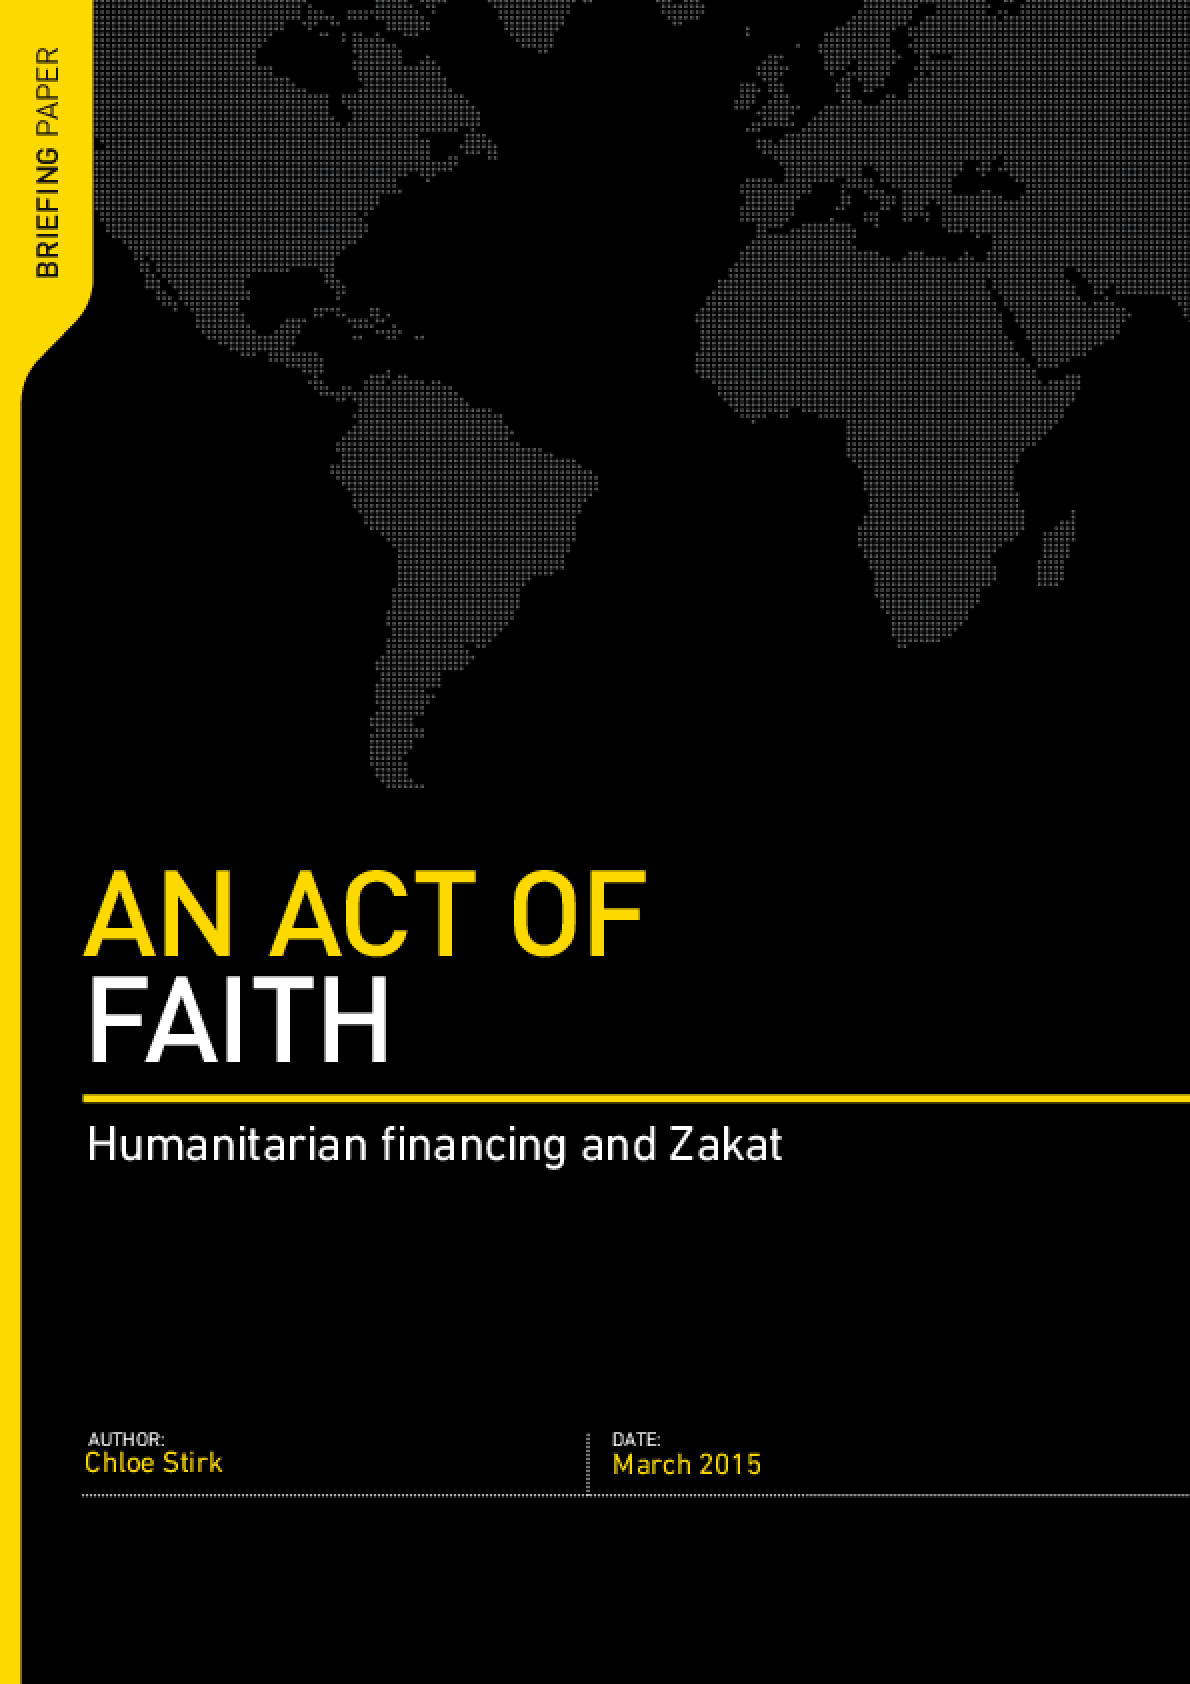 An Act of Faith : Humanitarian Financing and Zakat